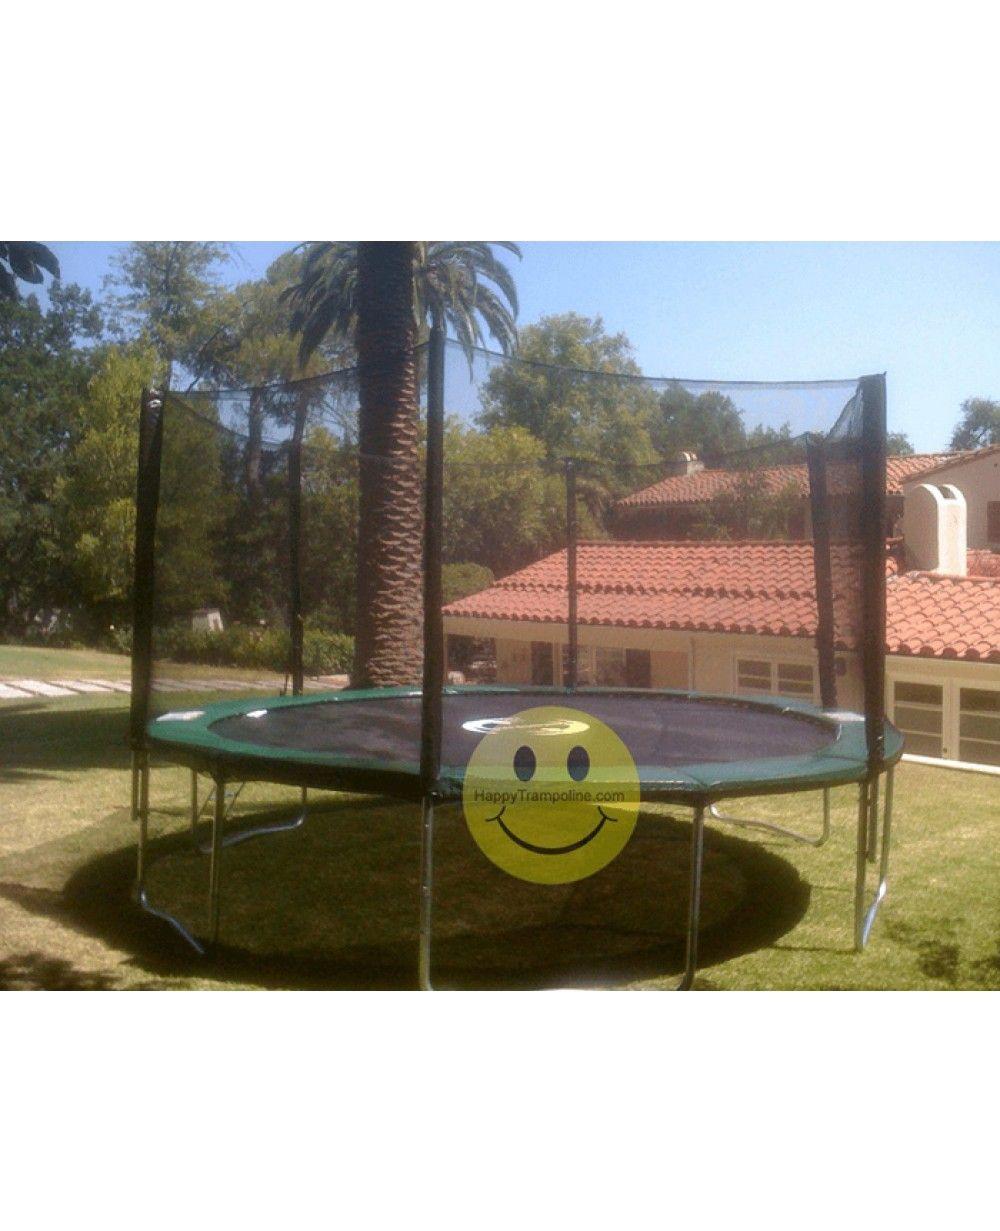 Bring home this season best kids trampoline which is ...